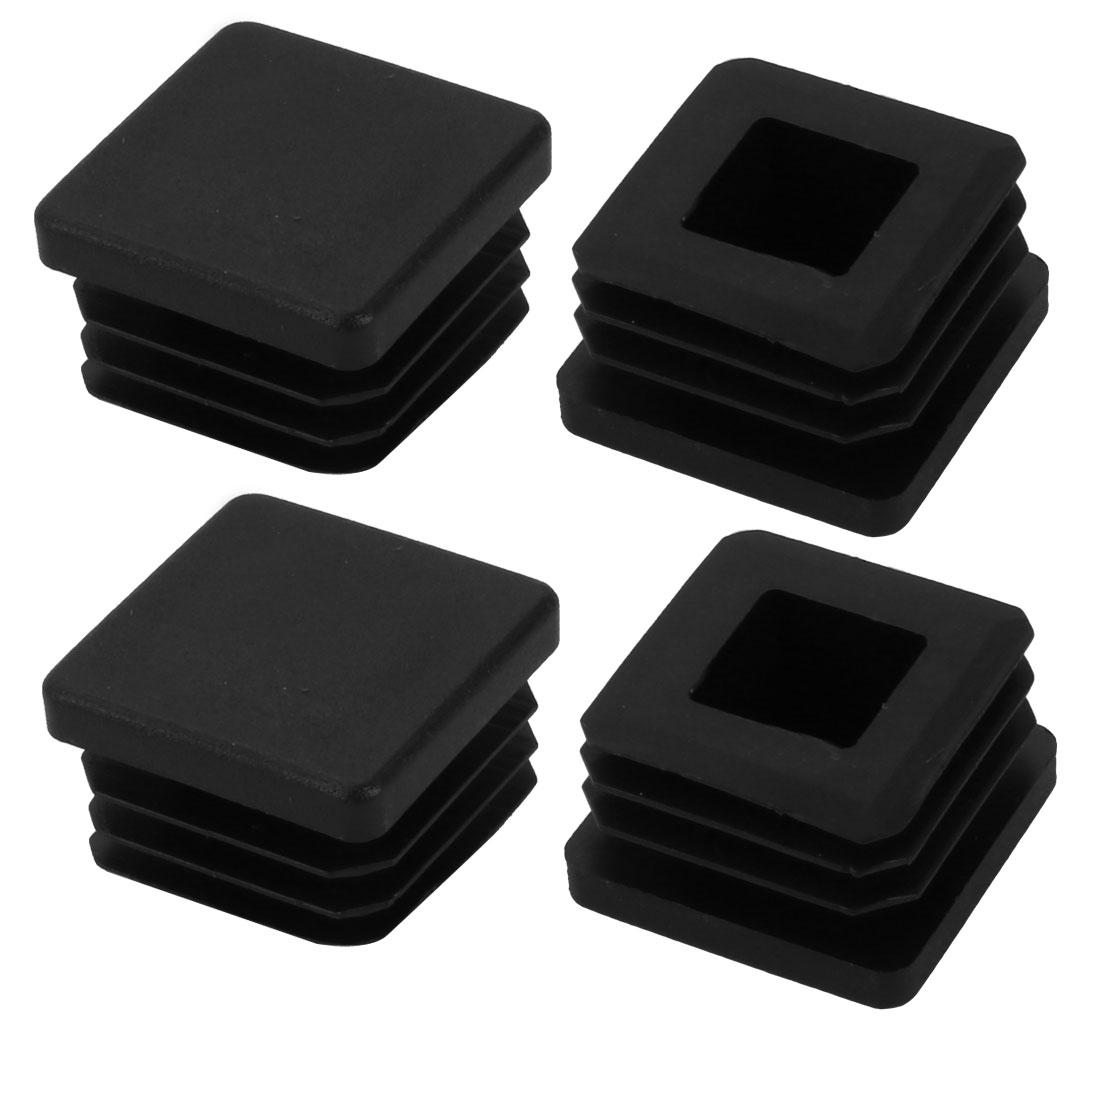 4pcs 25mm x 25mm Pipe Tube Insert Chair Leg Cap Black Plastic Tubing Plug